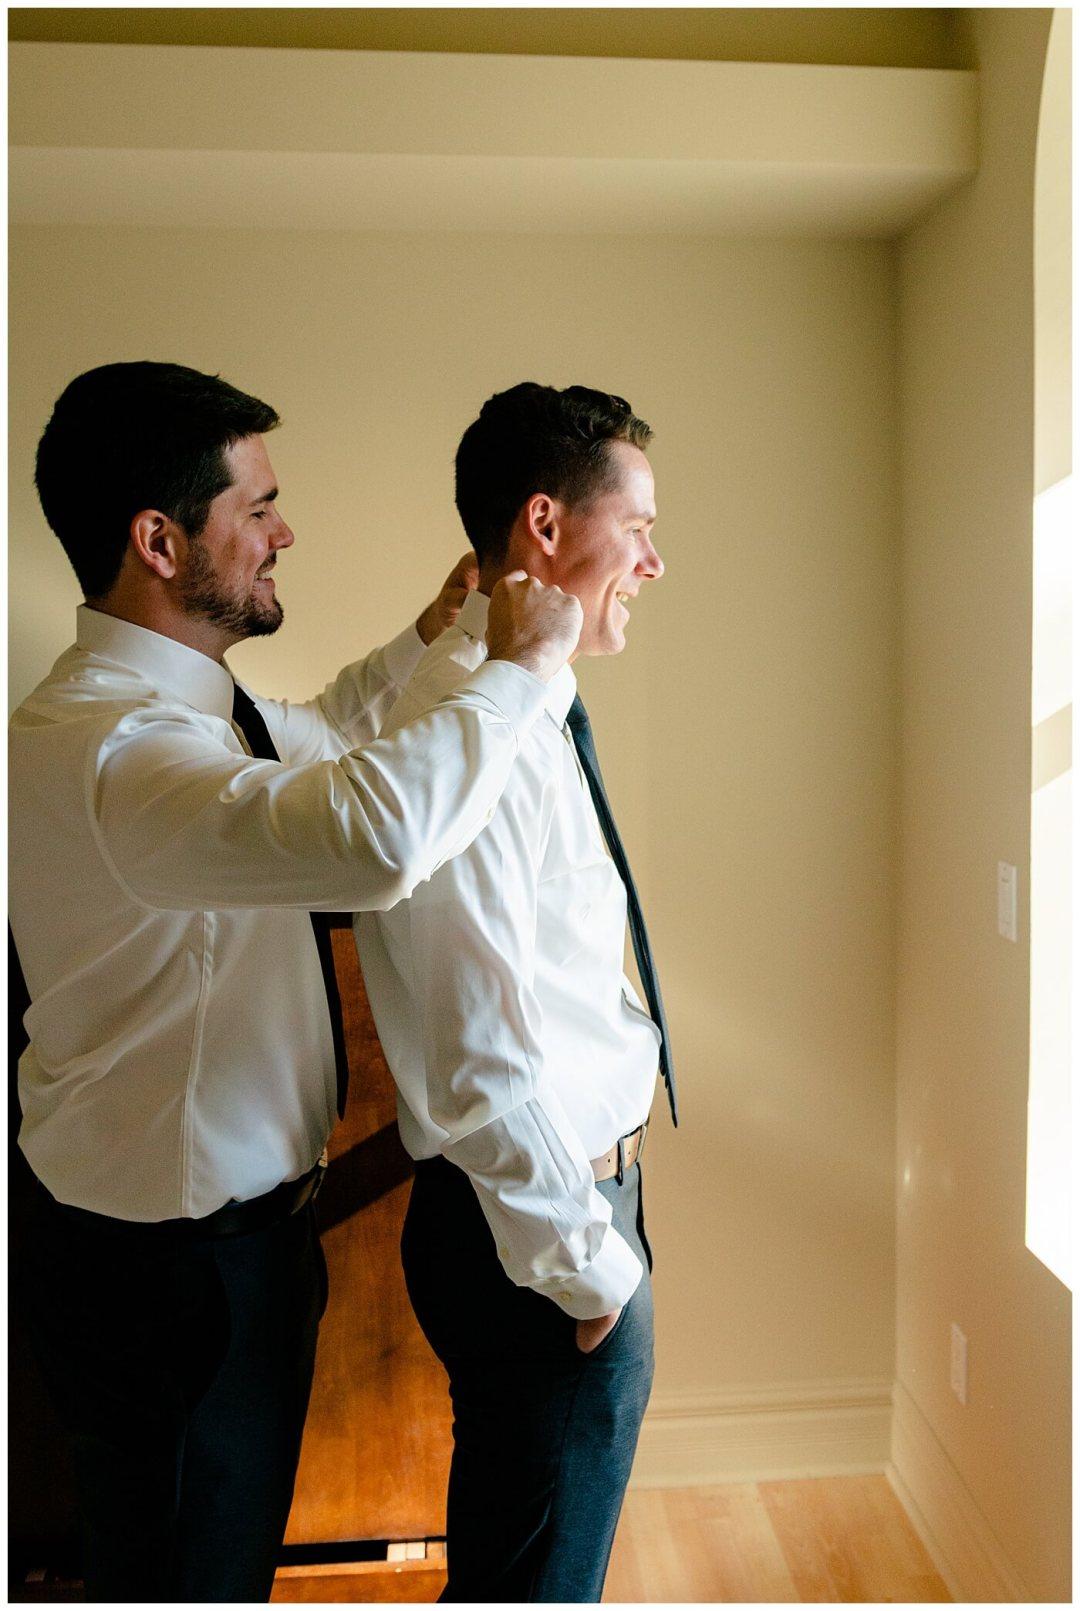 Regina Wedding Photographer - Tim & Jennelle At Home Wedding - Bestman helping with groom's collar